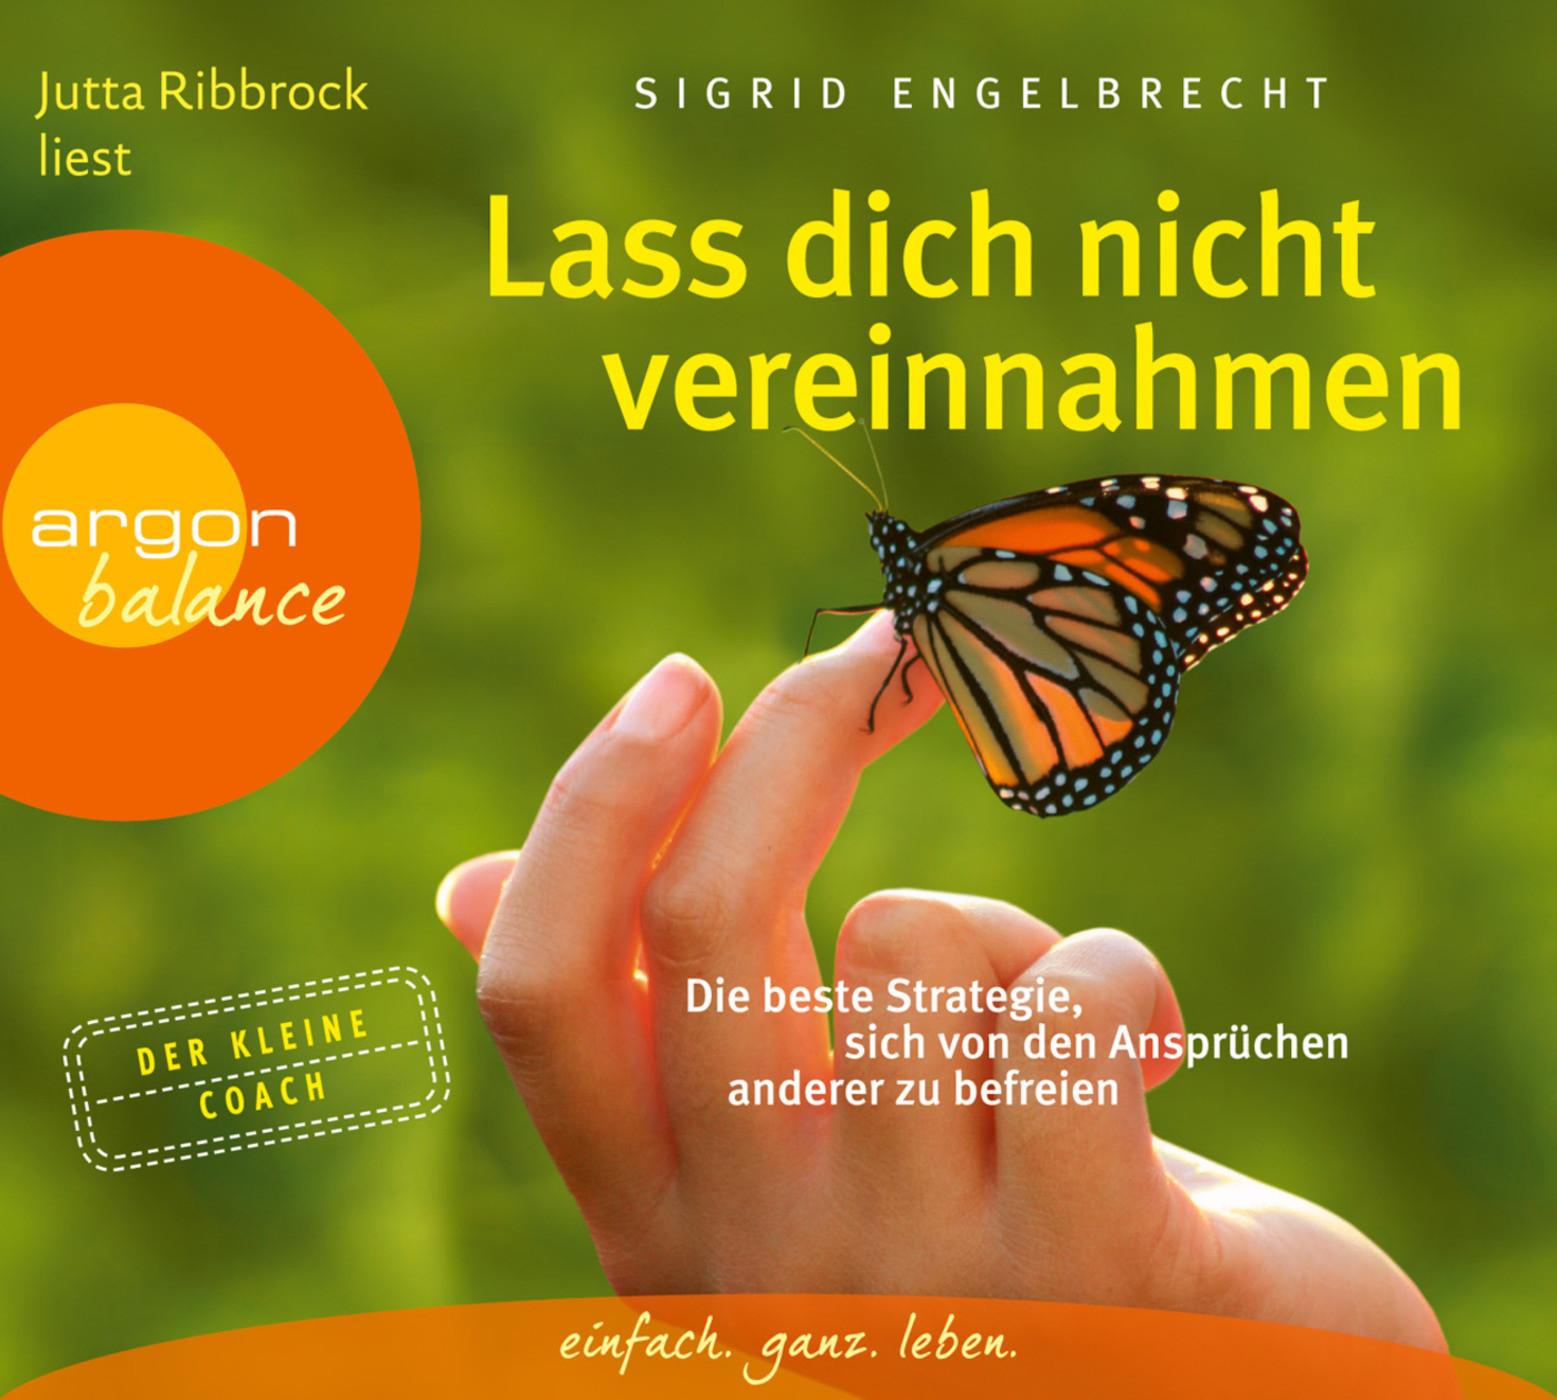 Sigrid Engelbrecht - Lass dich nicht vereinnahmen